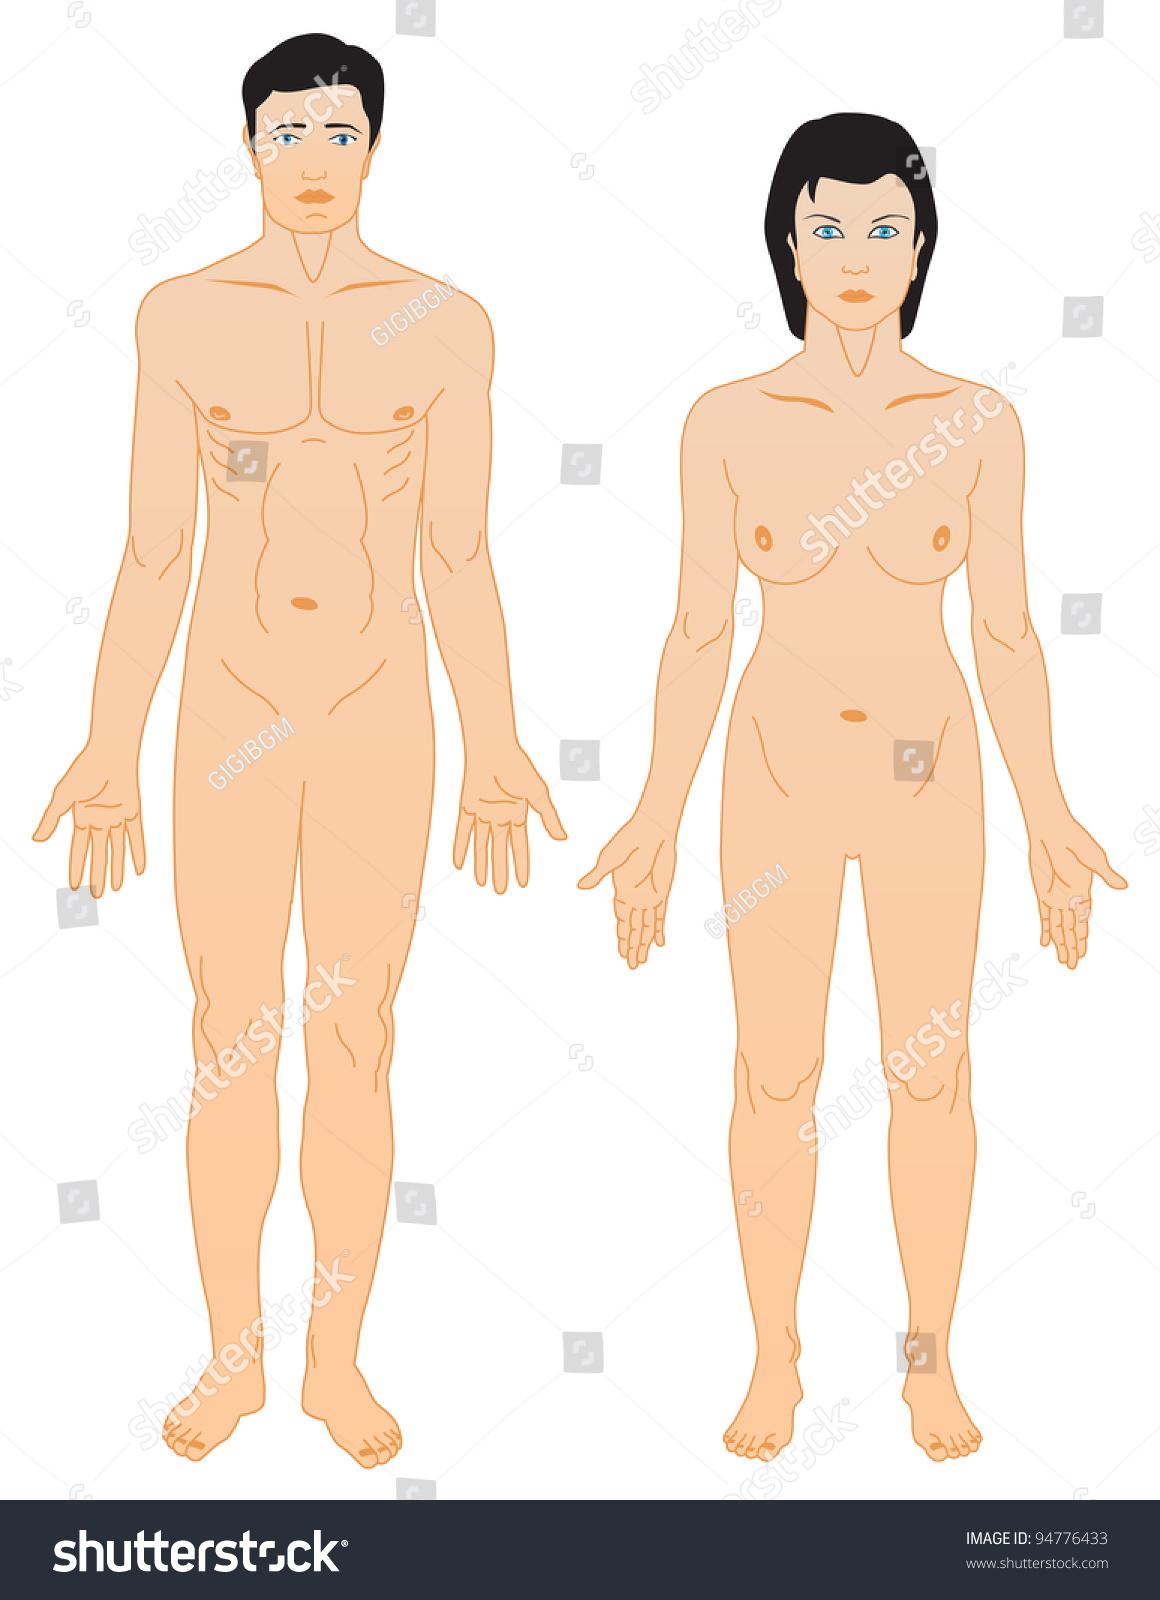 Royalty-free Man and woman anatomy #94776433 Stock Photo | Avopix.com